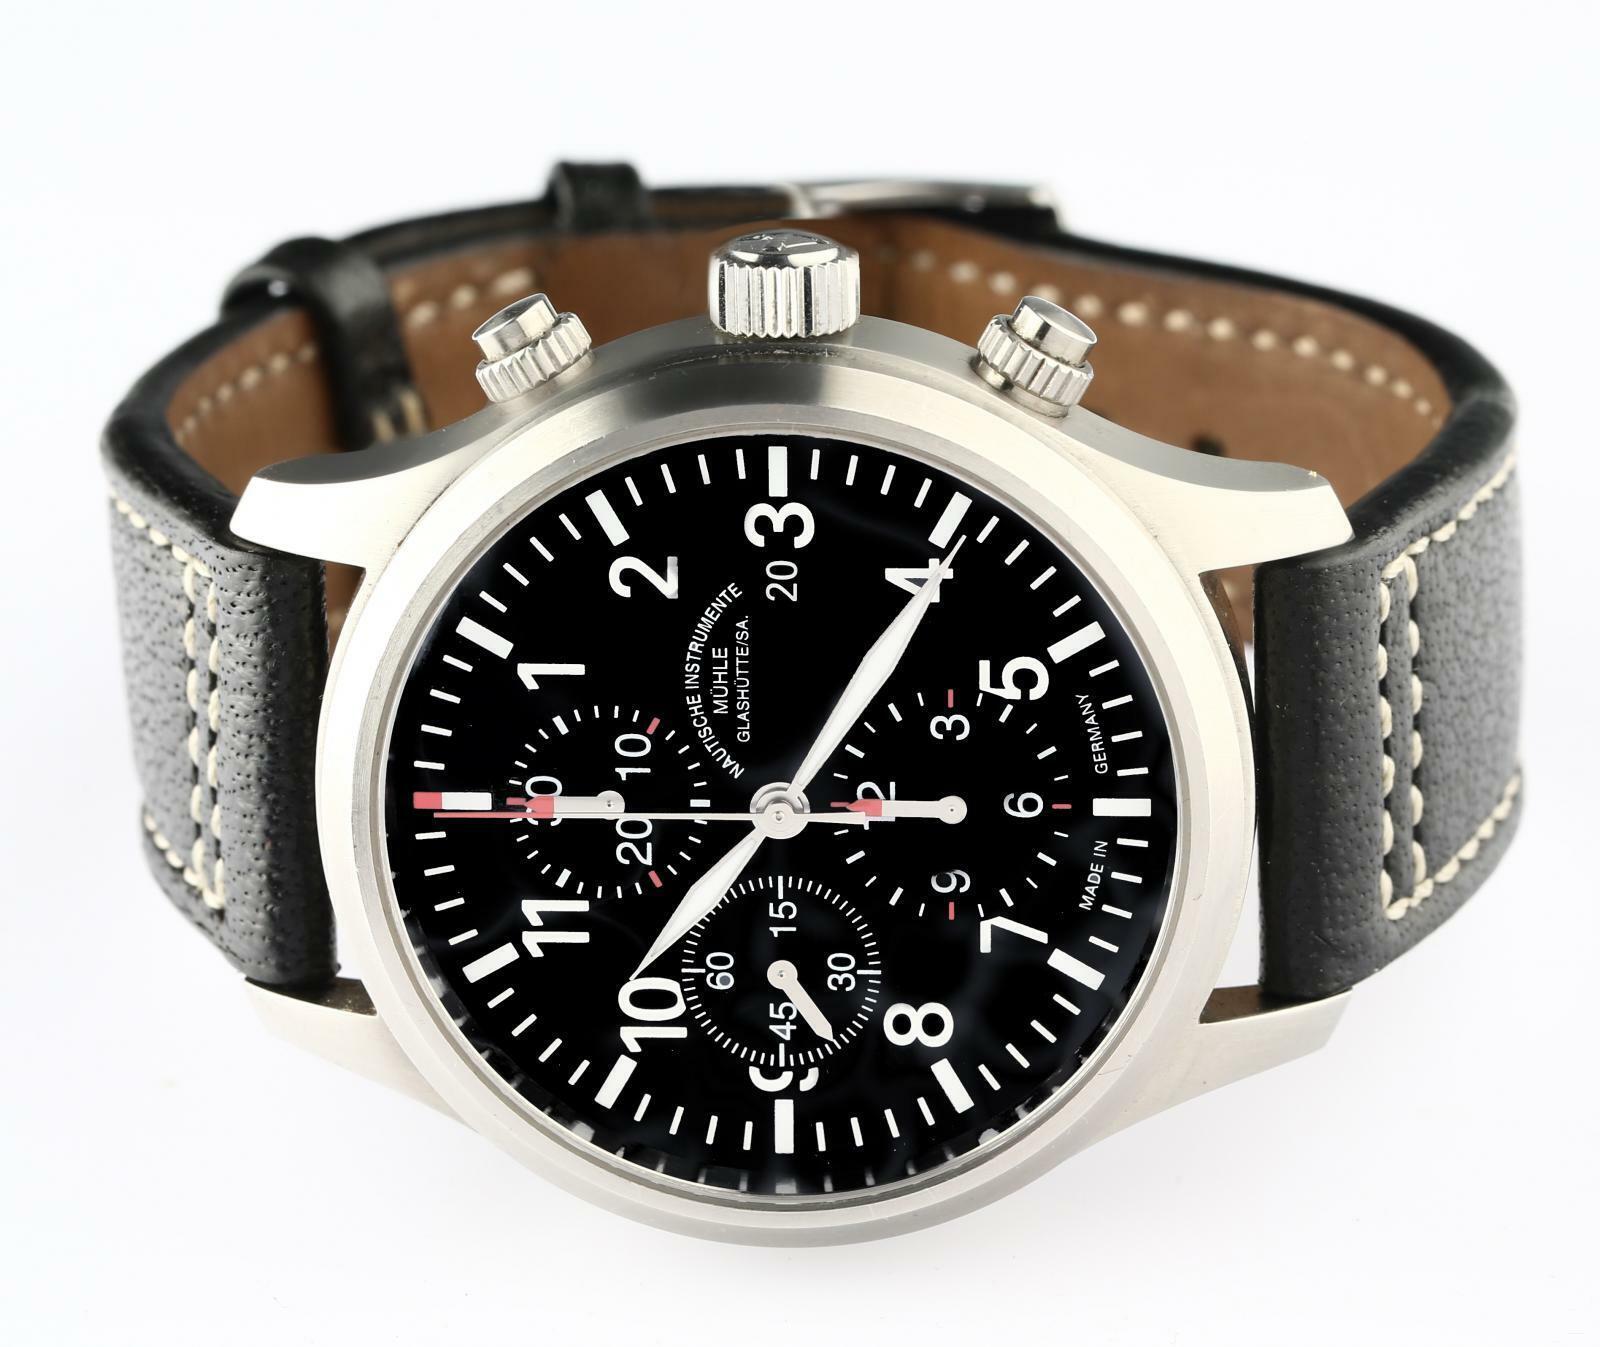 Glashutte / SA Muhle Terrasport Ref# M1-37-70 Automatic Chronograph Wristwatch - watch picture 1